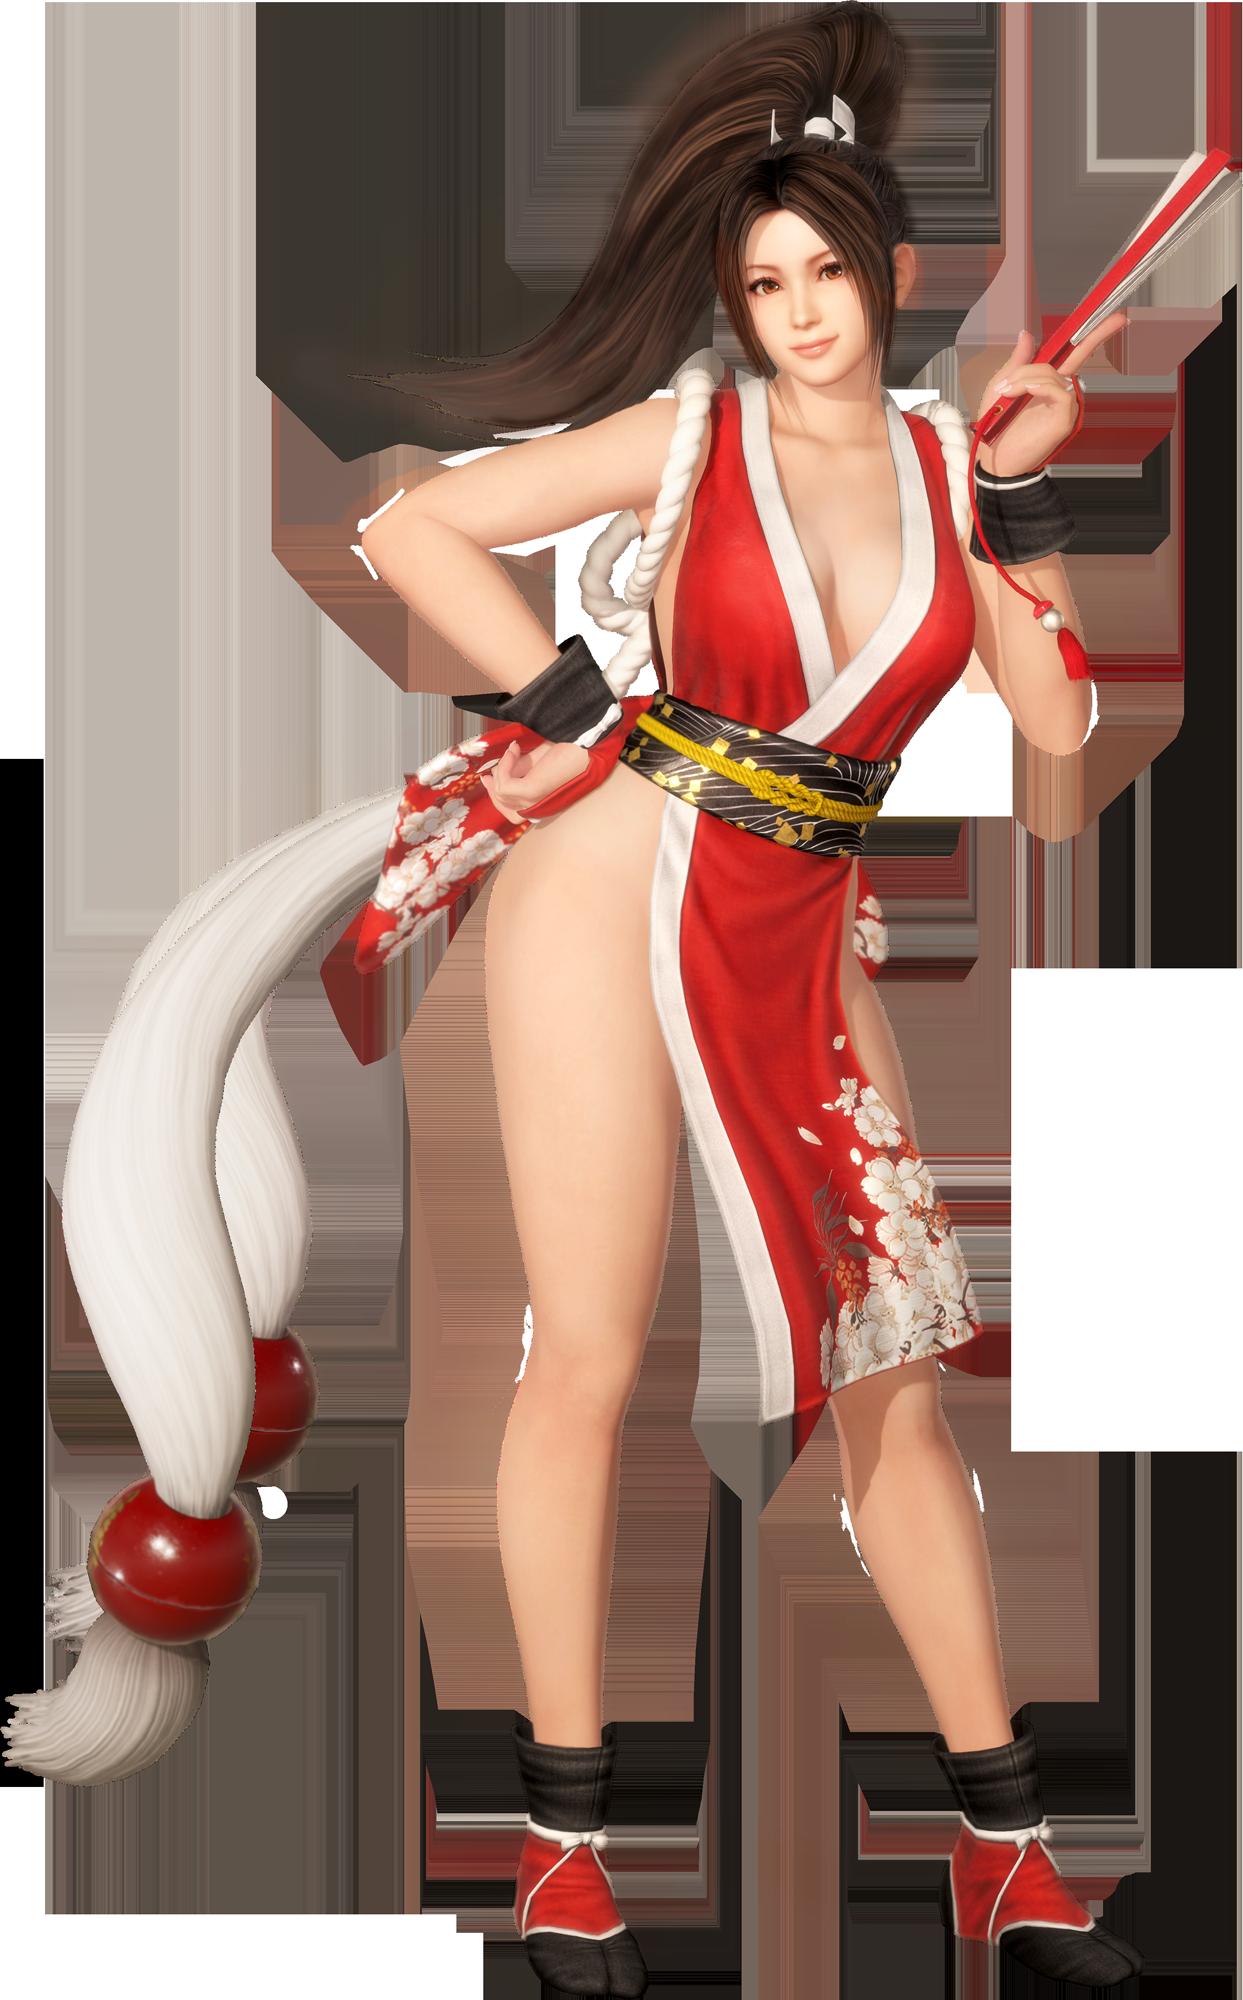 Tidus - Kingdom Hearts Wiki, the Kingdom Hearts encyclopedia